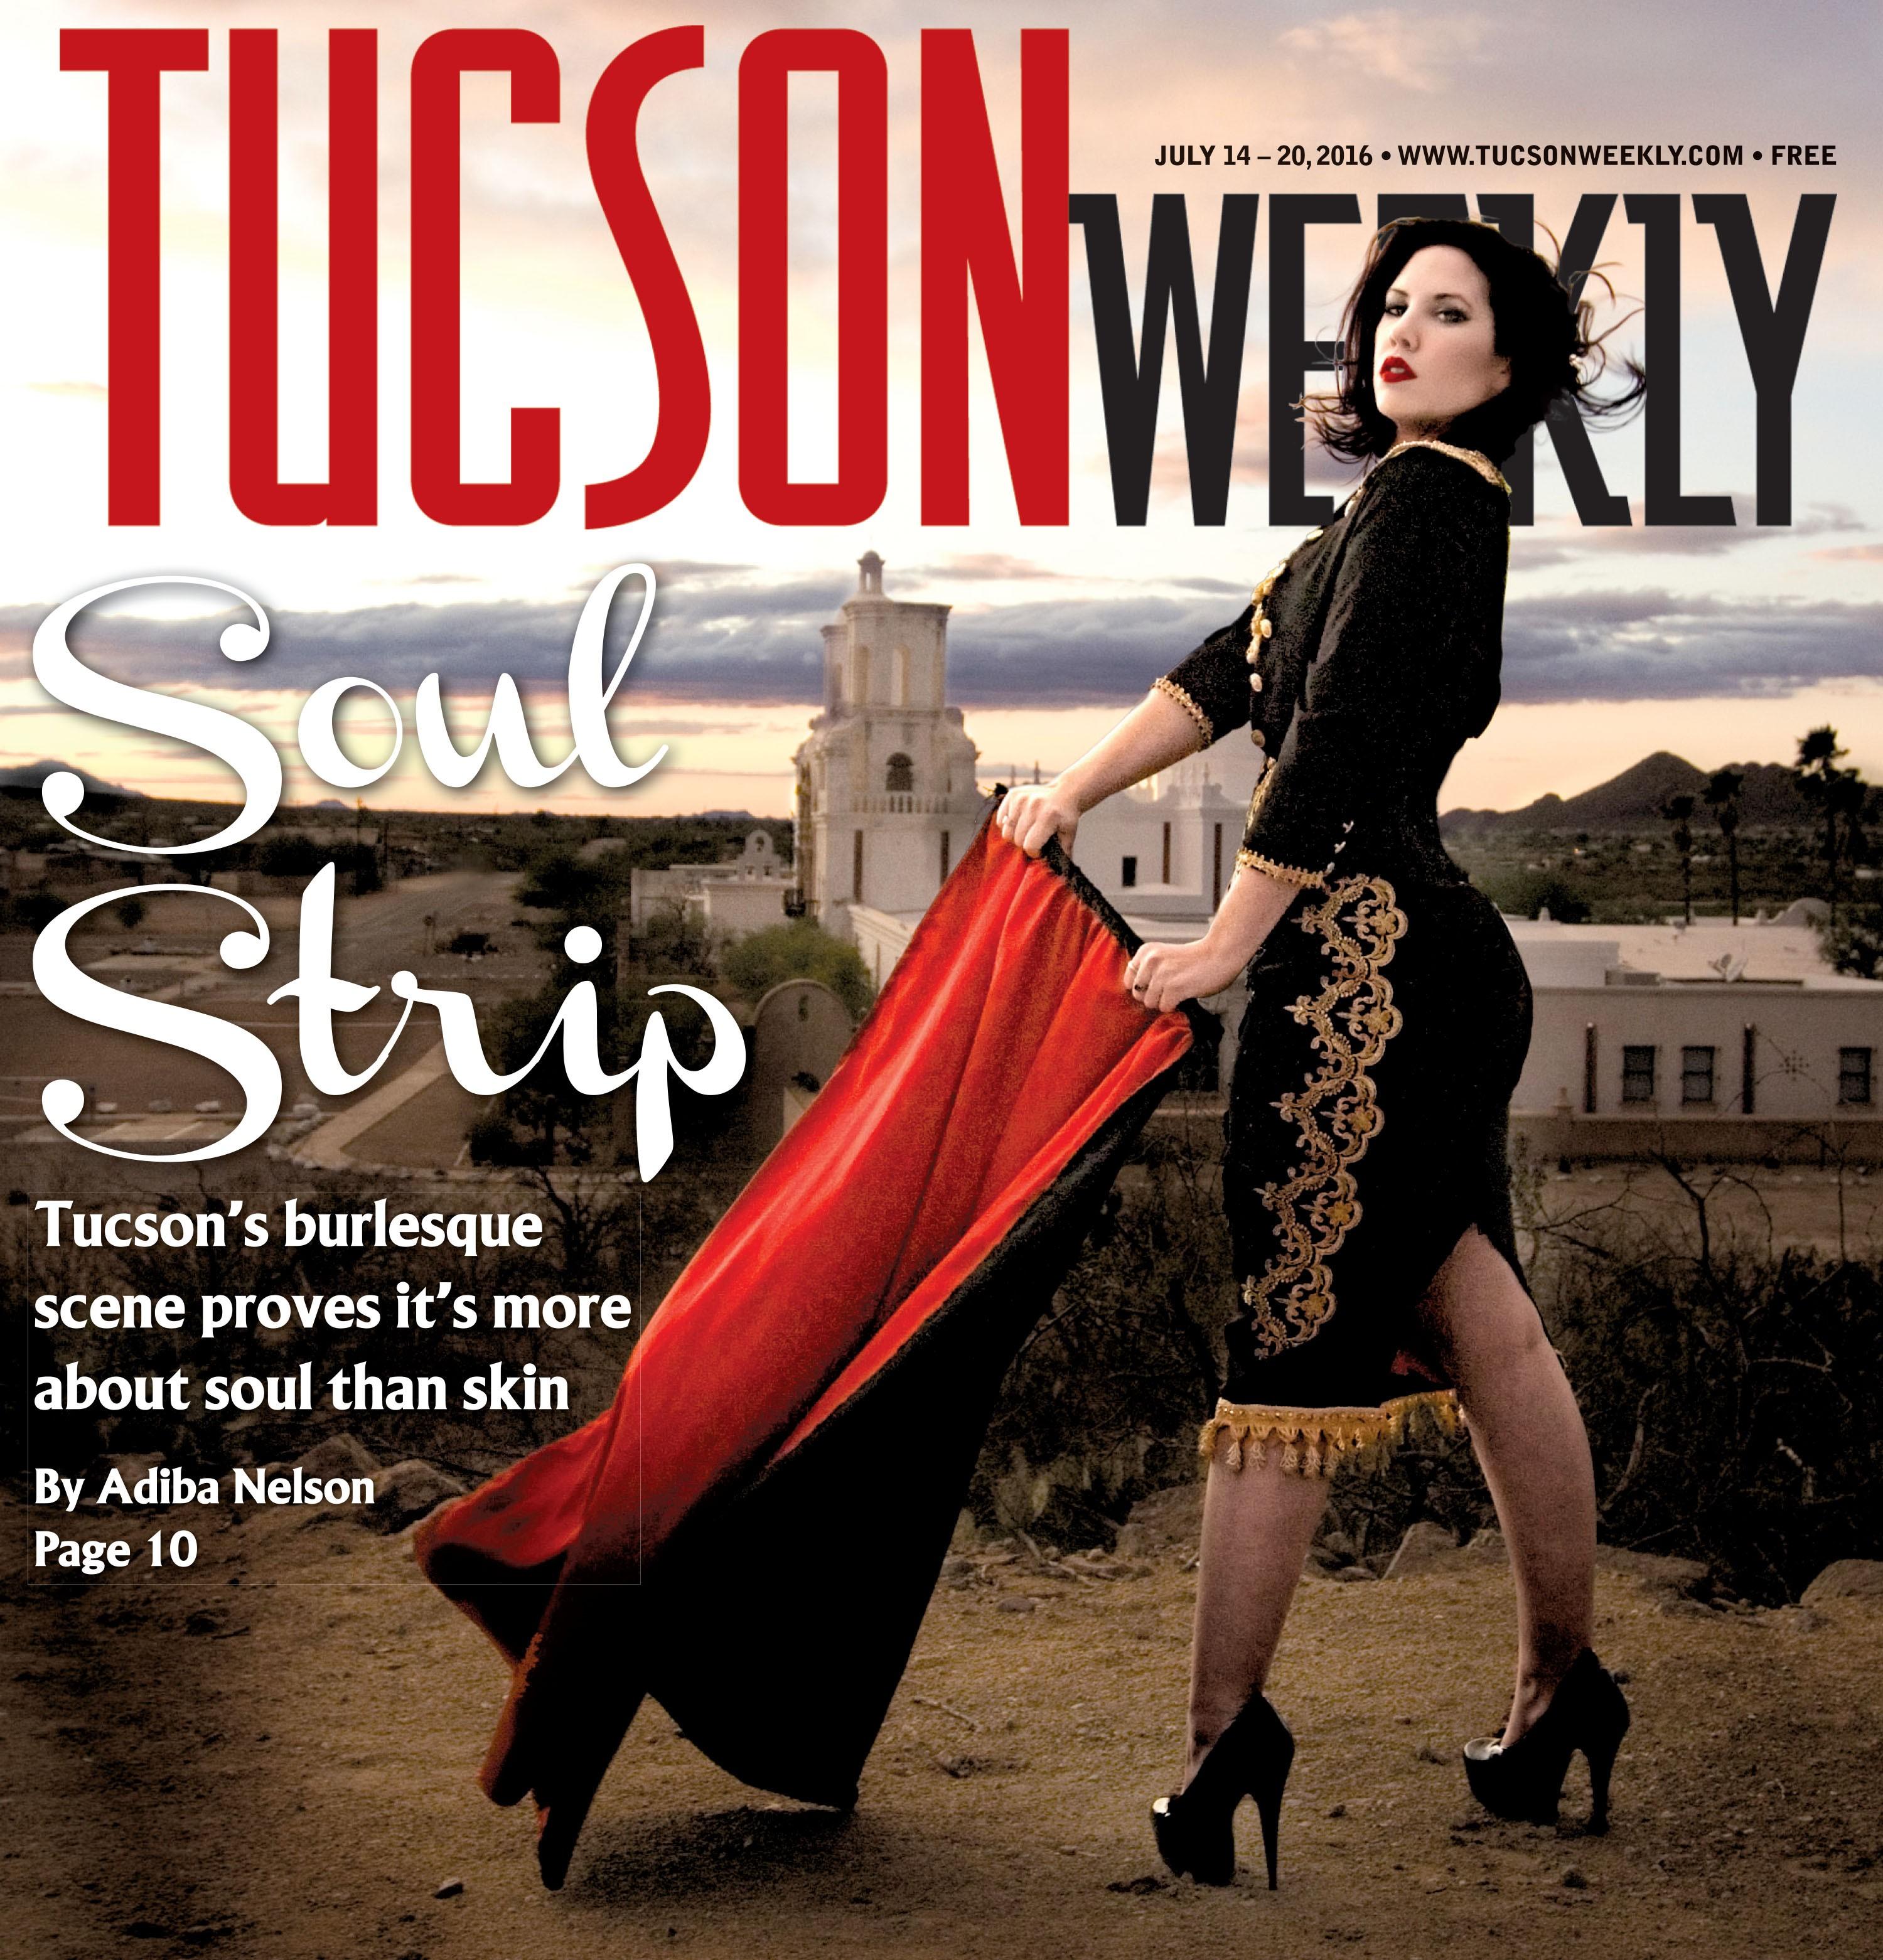 Tucson casual encounters